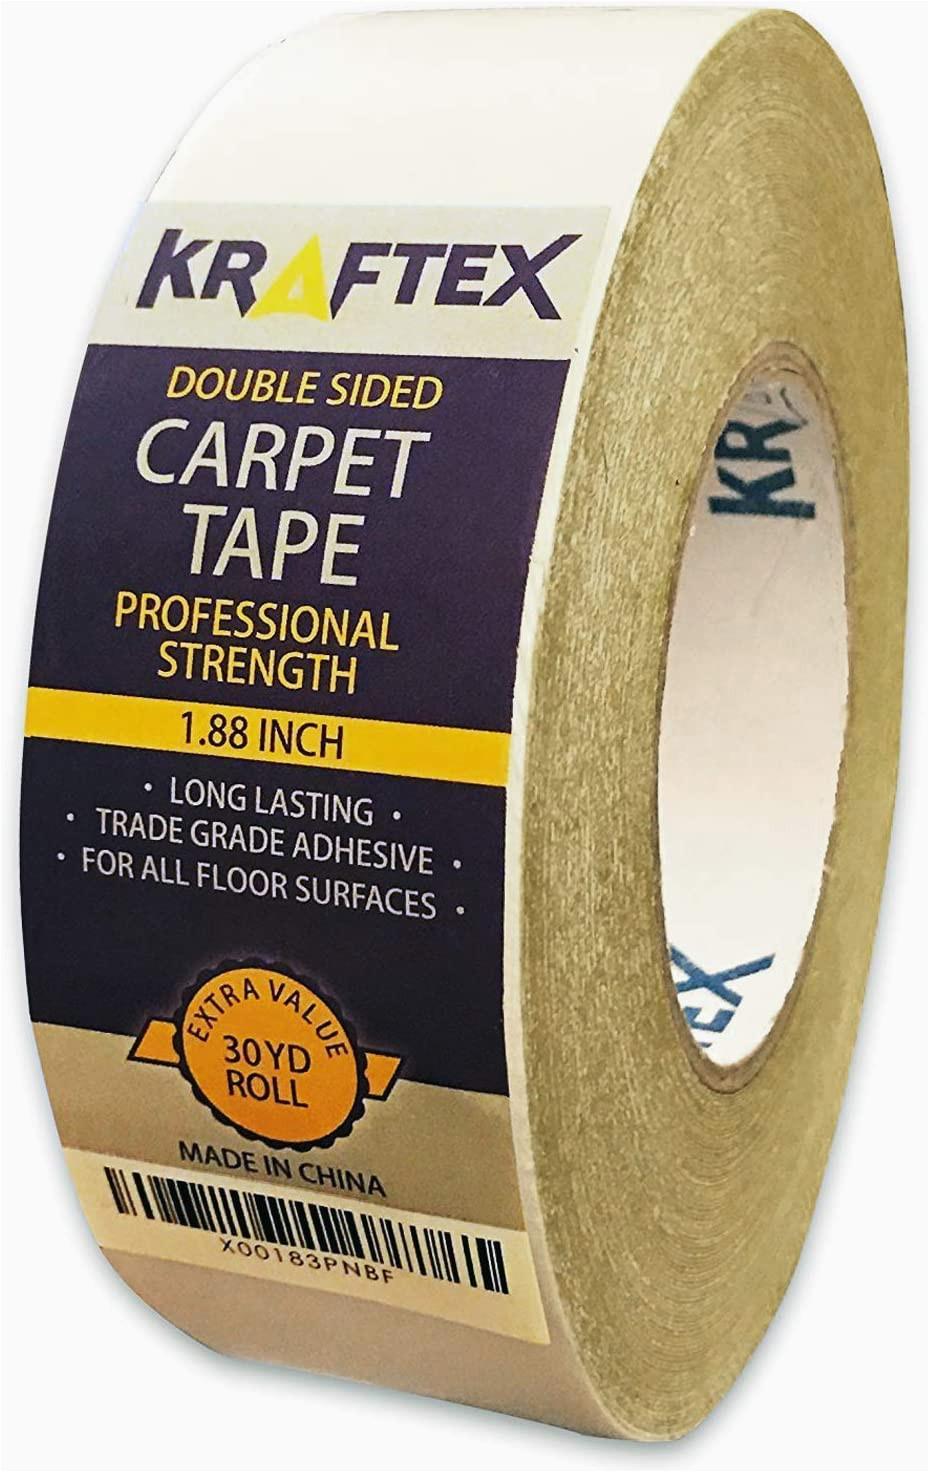 Best Carpet Tape for area Rugs Double Sided Carpet Tape 90ft 30yrd Roll Double Sided Tape Heavy Duty for Rugs Mats Pads & Runners Rug Tape for Hardwood Floors Tile Laminate 2